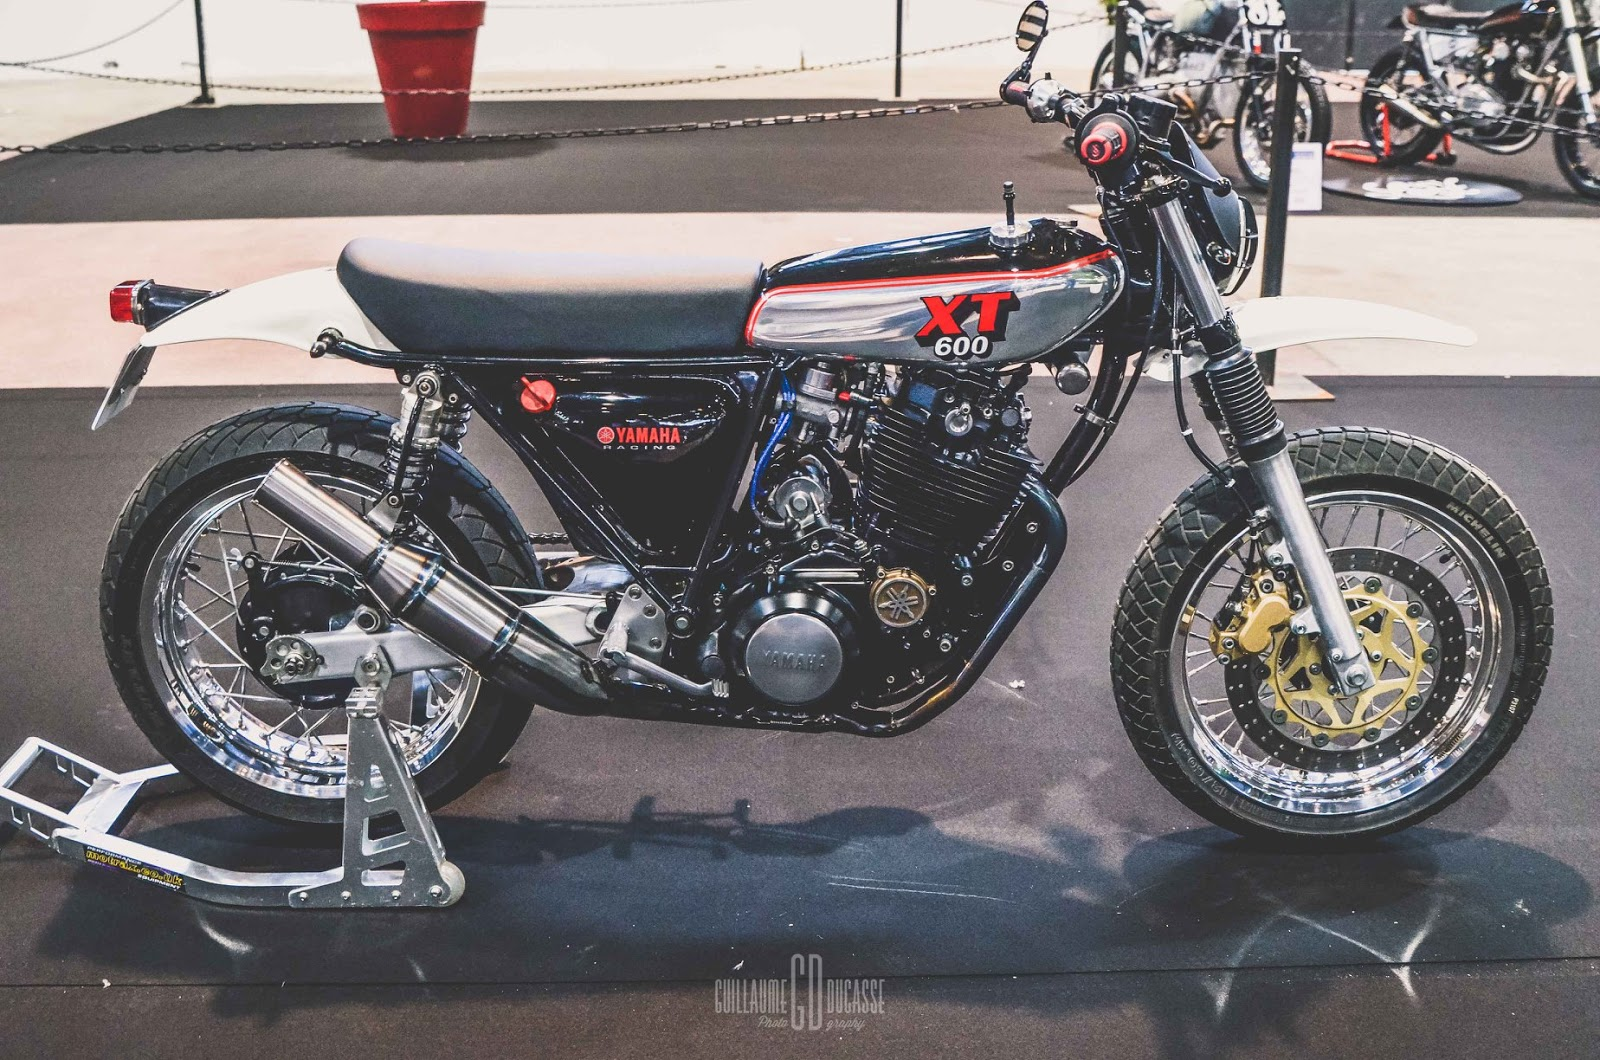 Hot Rod Moto Moto Cafe Racer Motard Retro Motorsport Racing Vintage